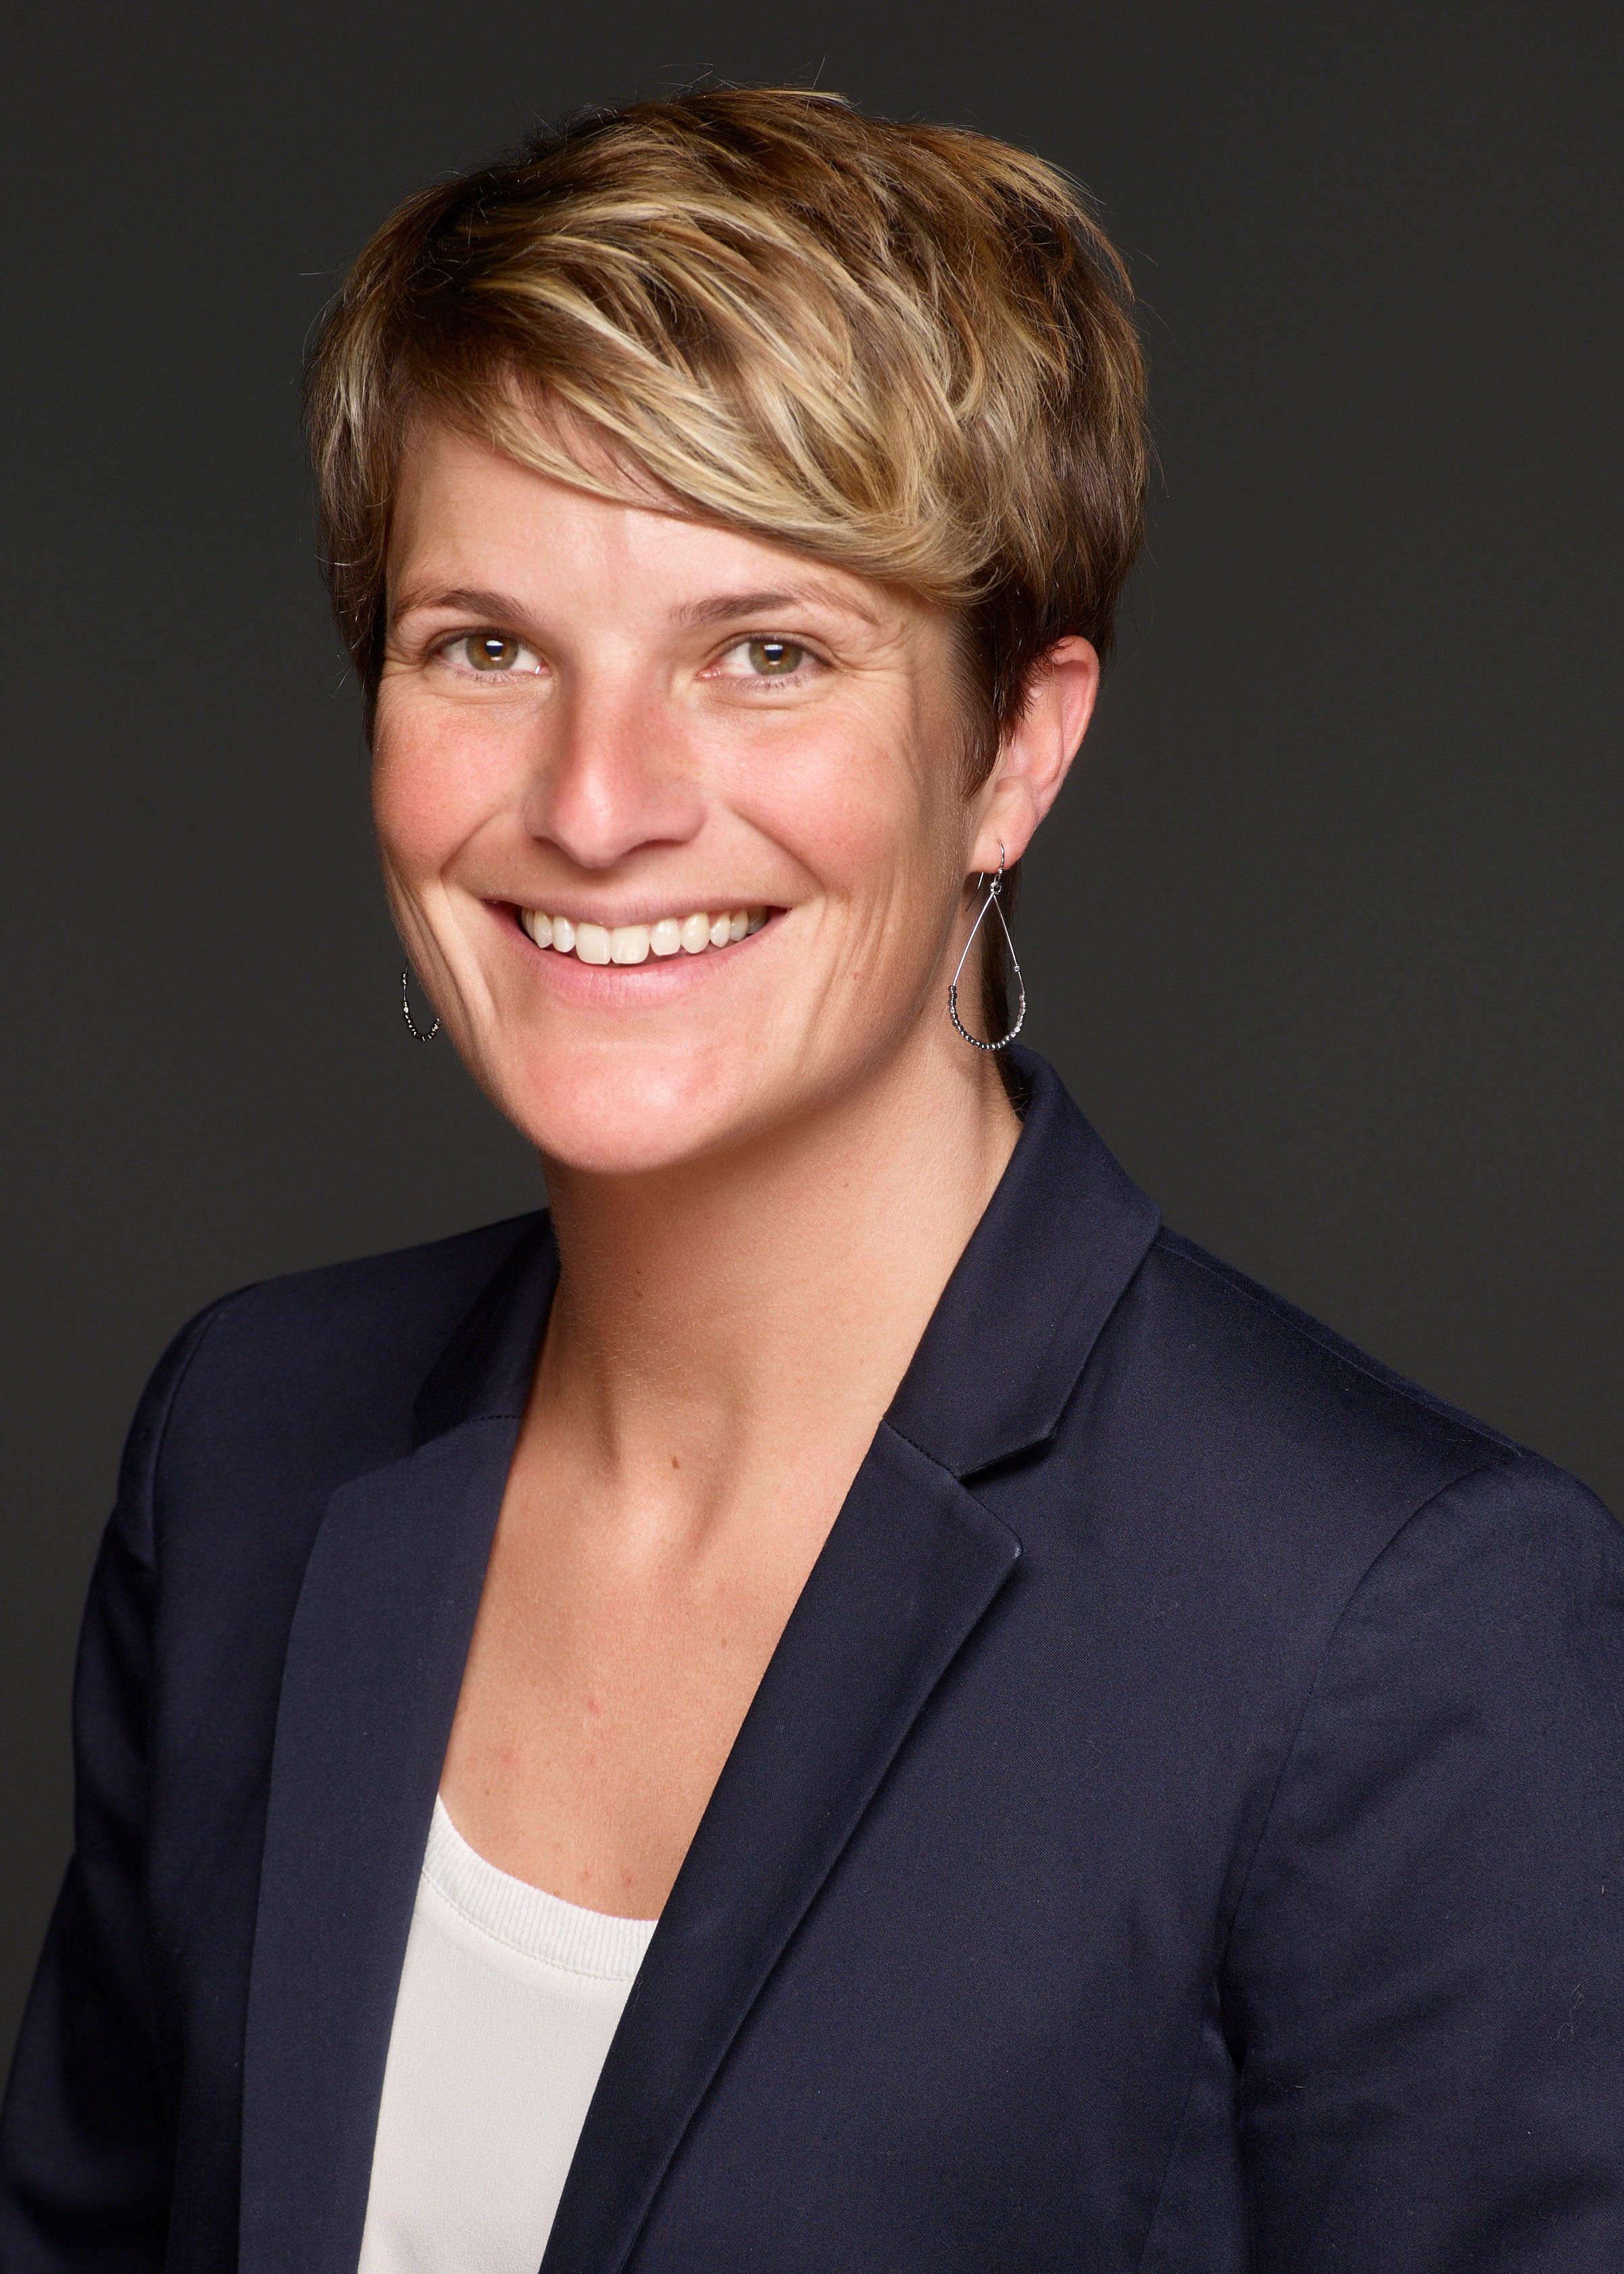 Sarah Mancinelli